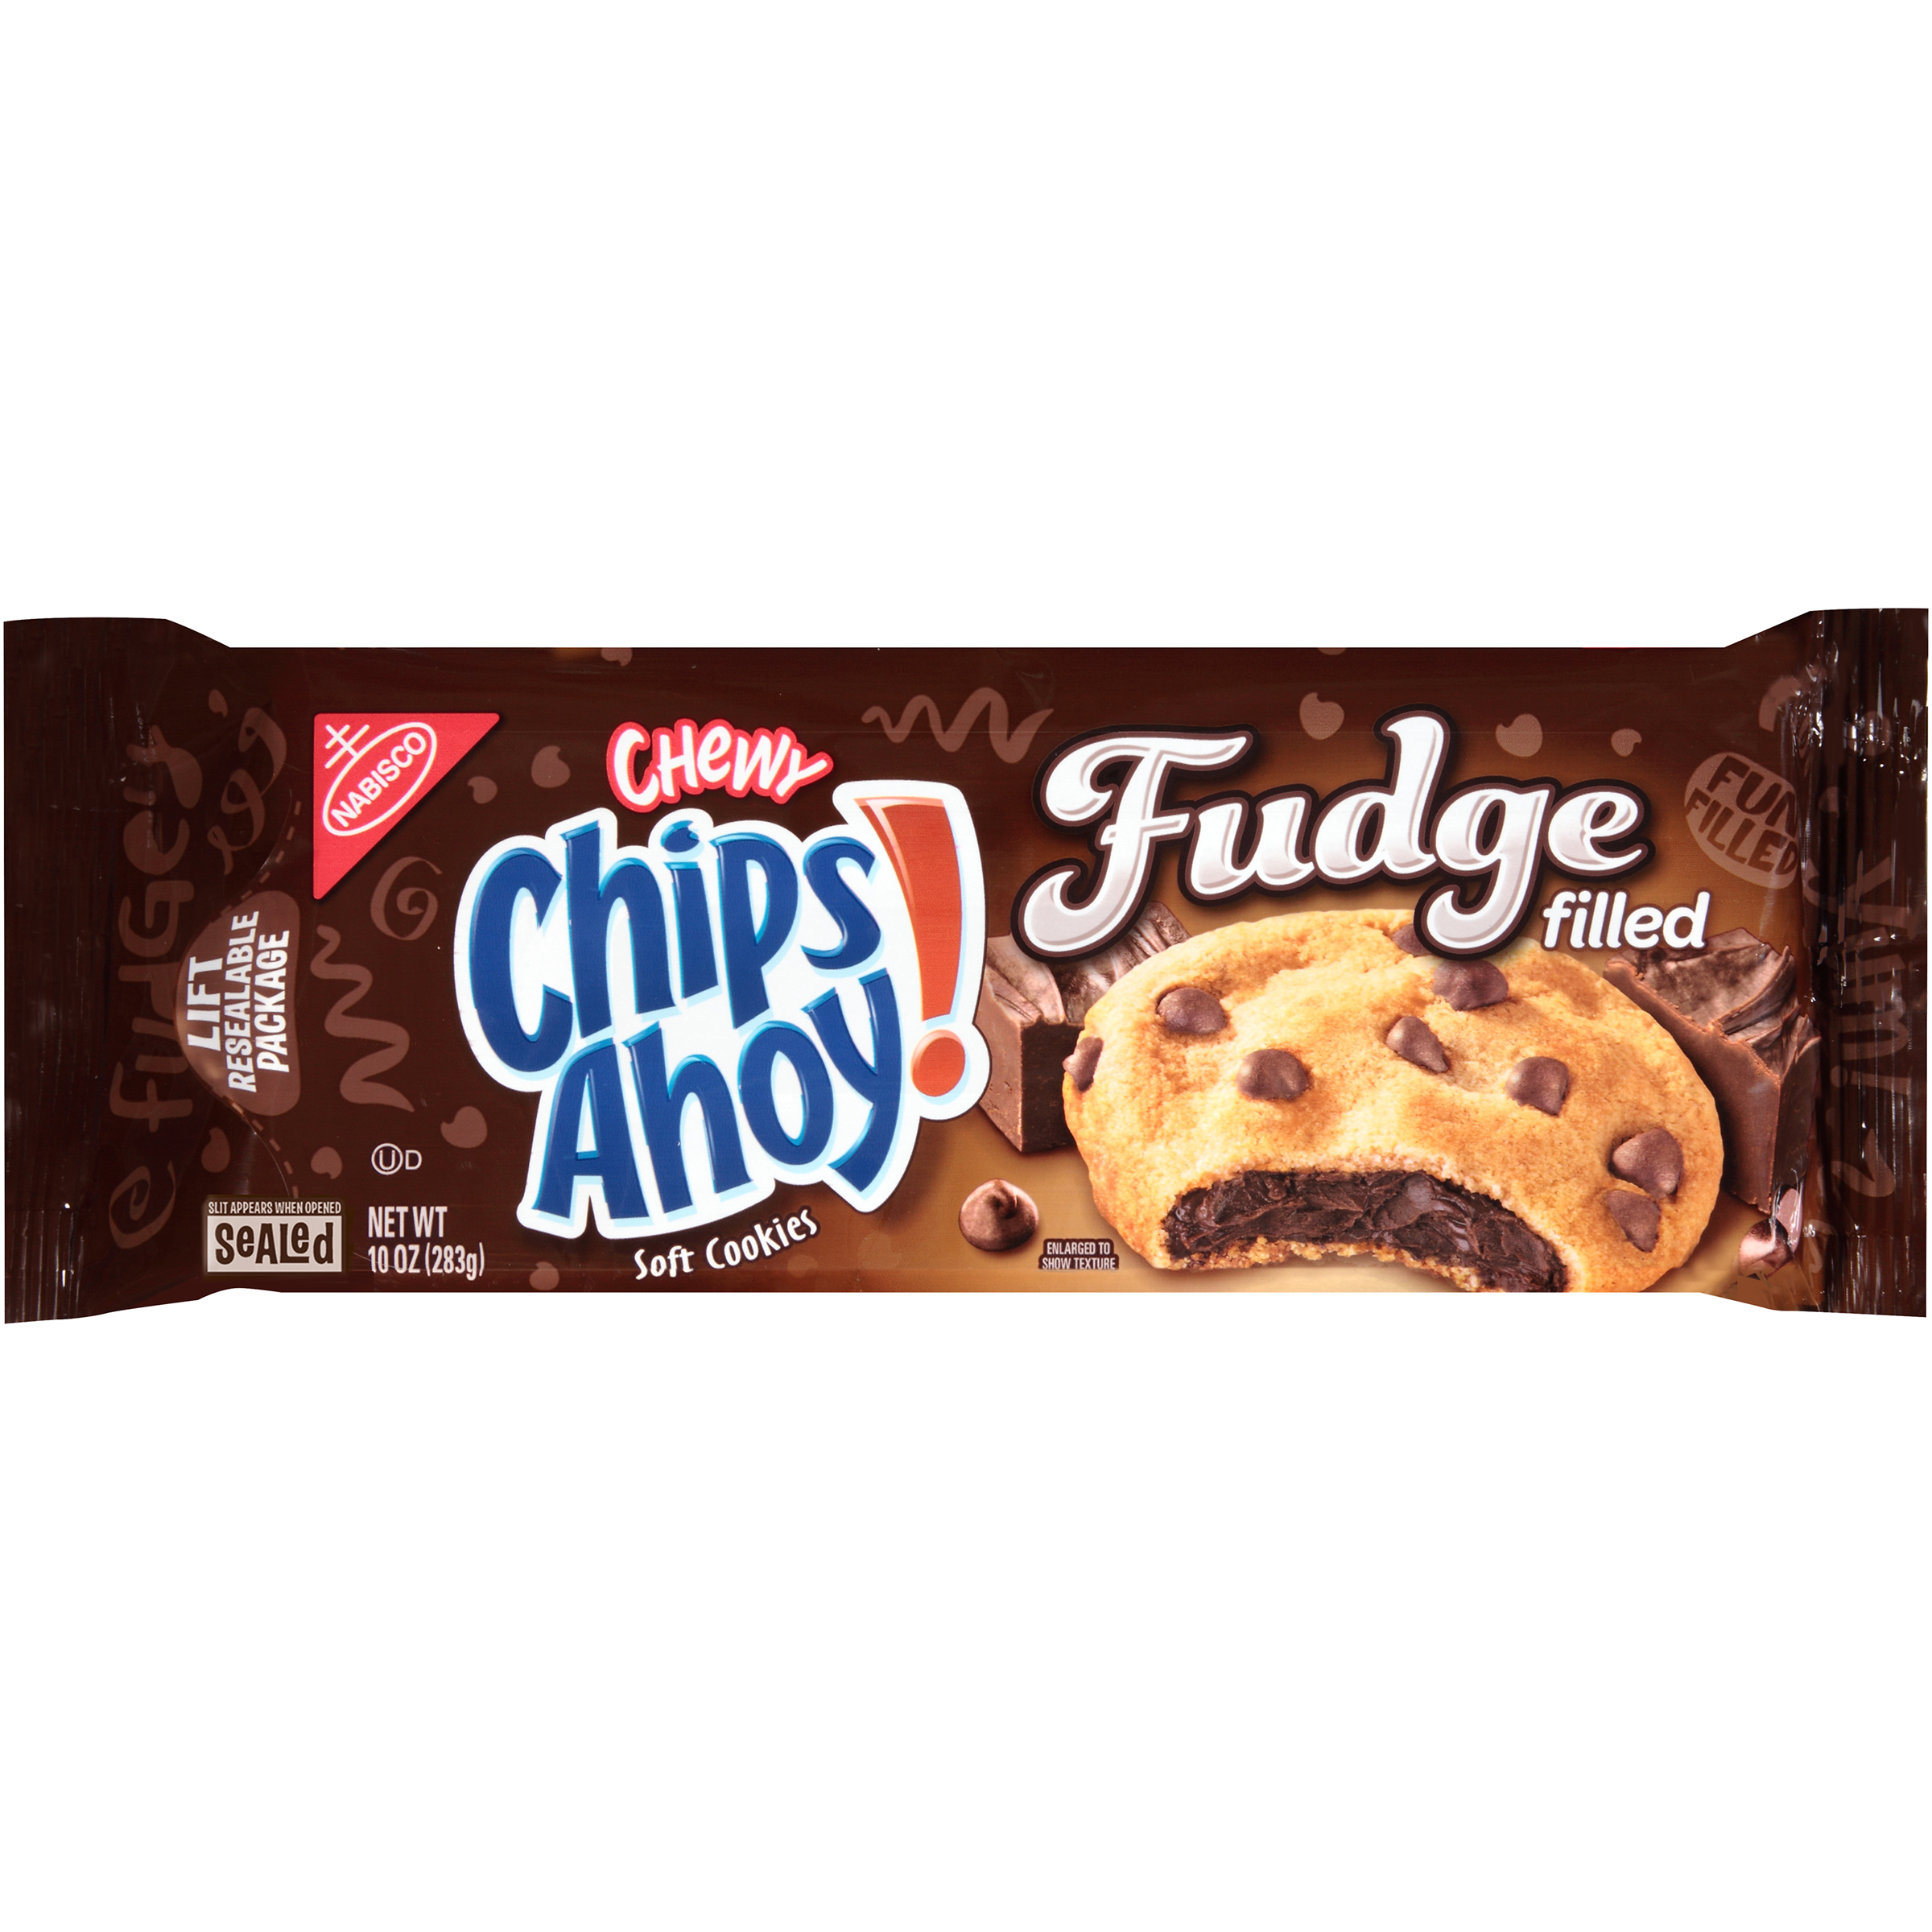 CHIPS AHOY! Chewy Chewy Gooey Chocfudge Cookies 10 oz